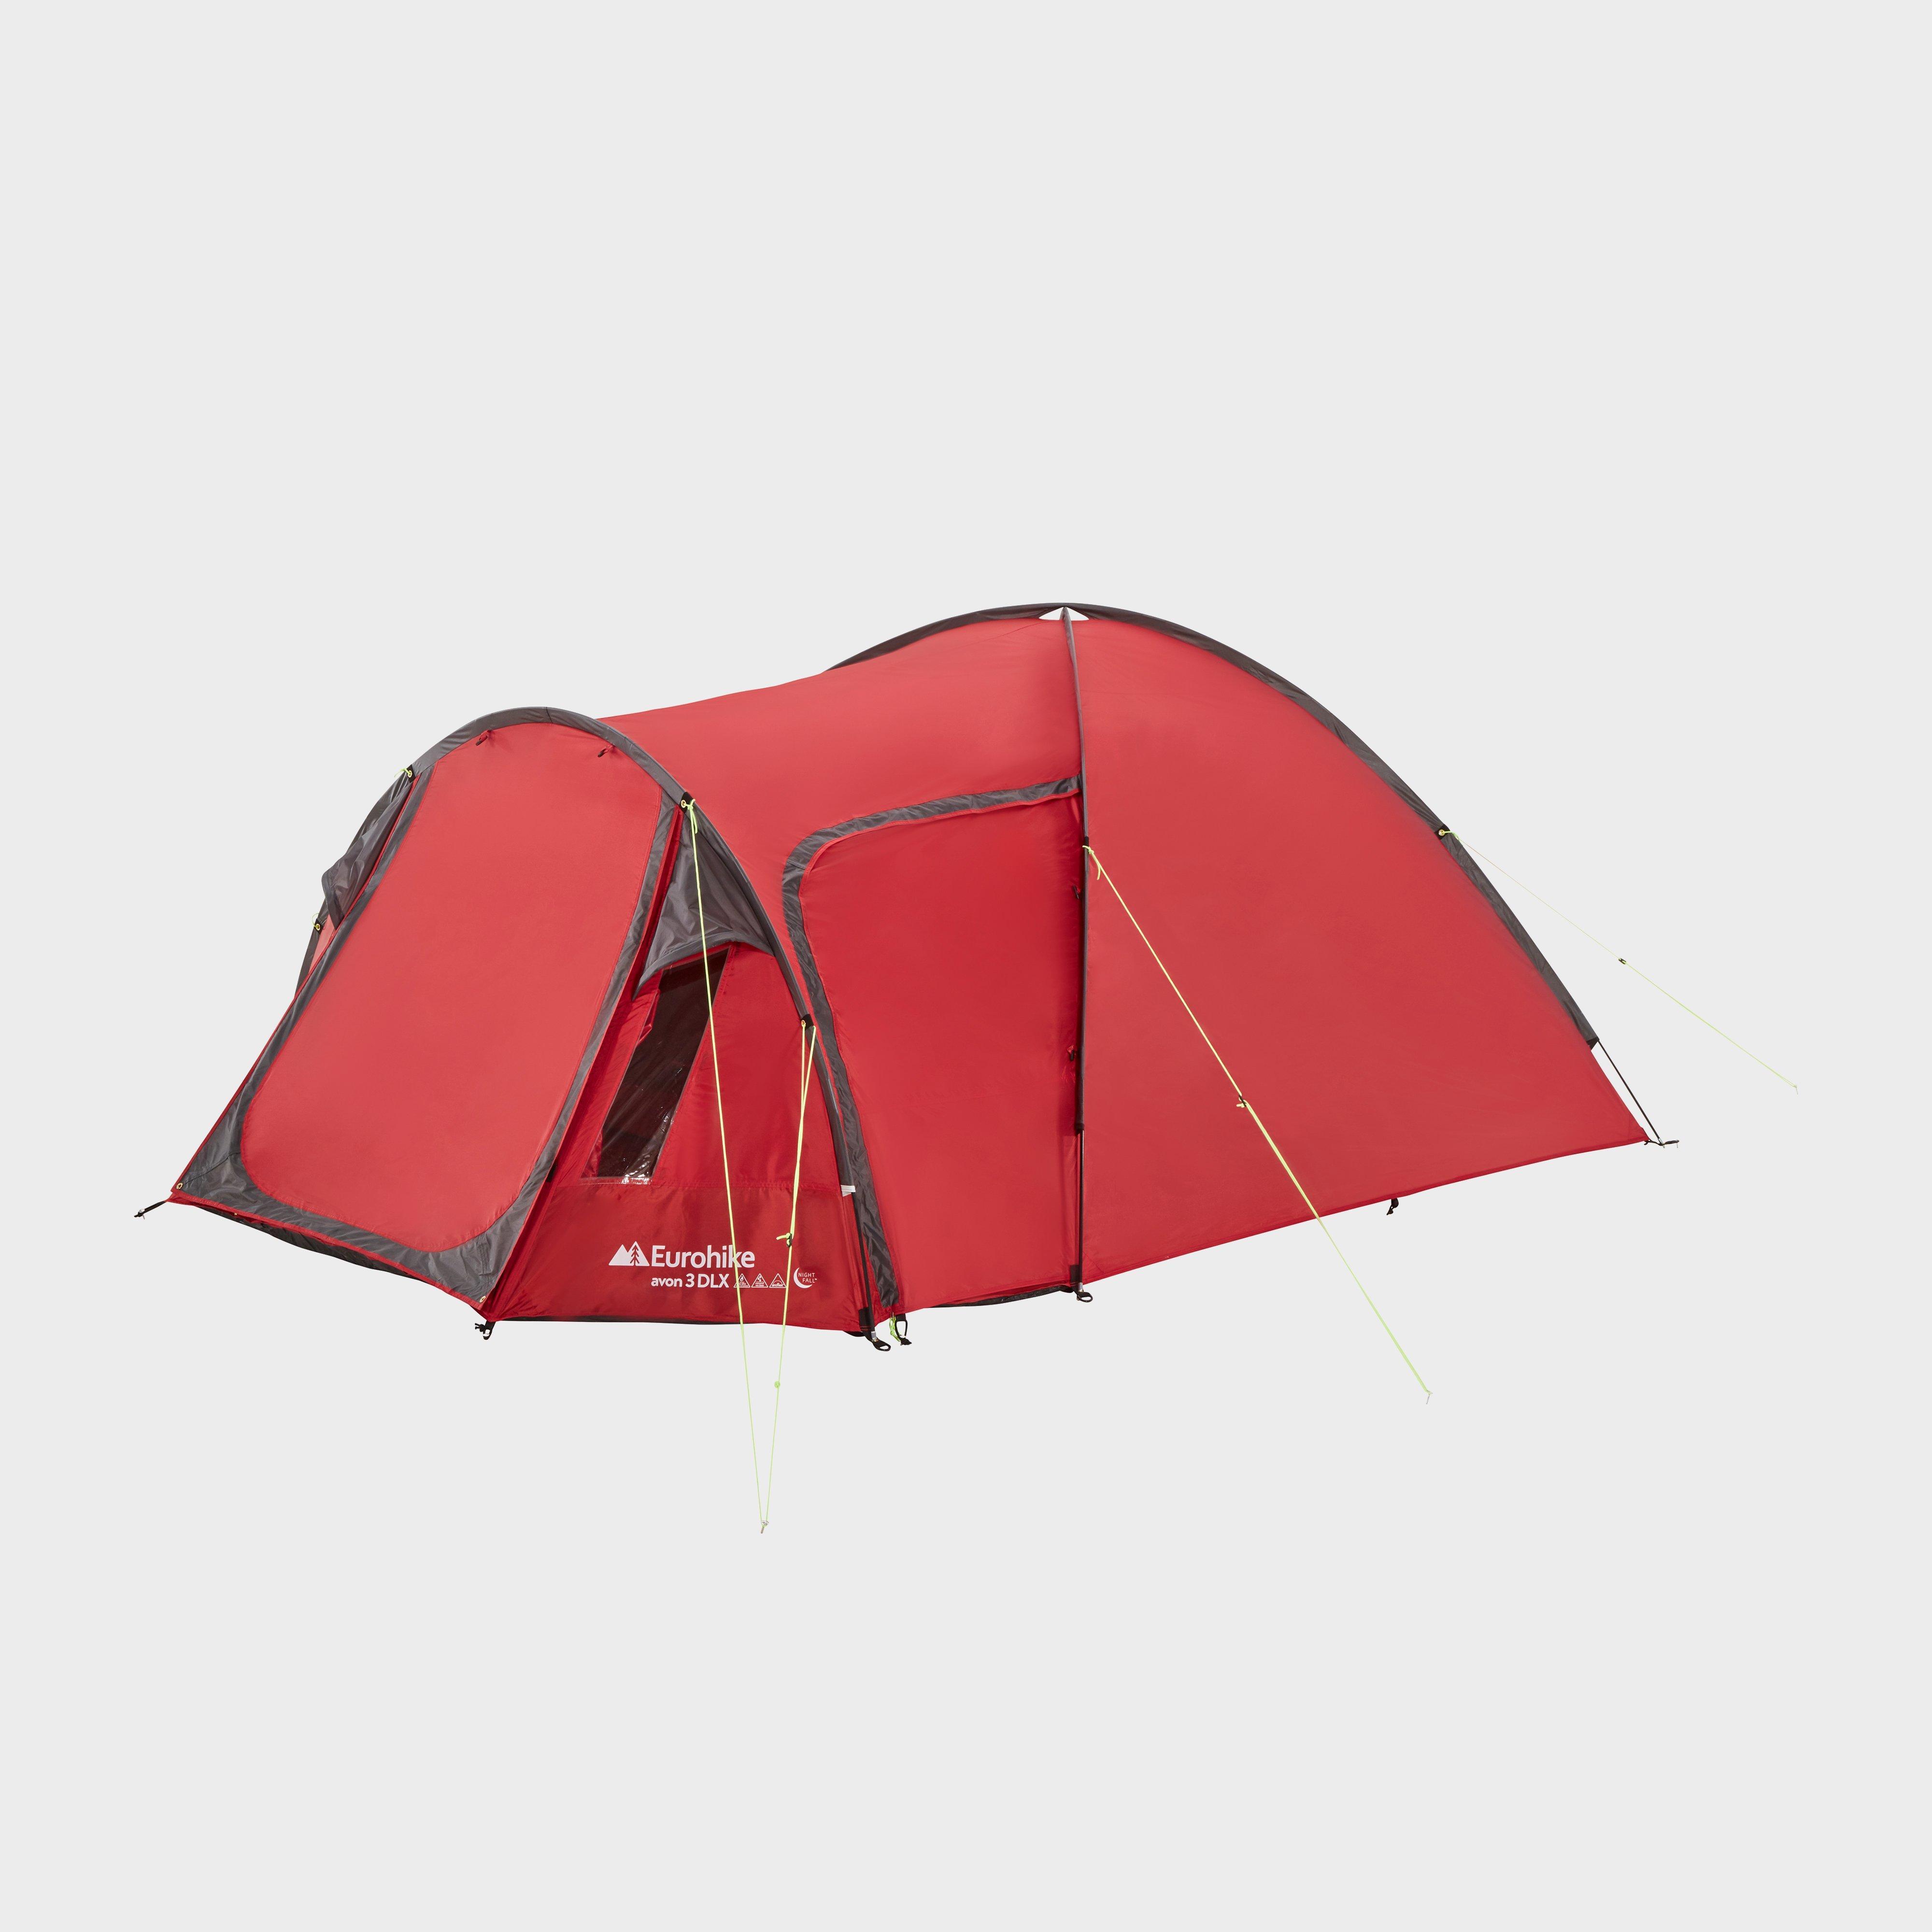 Eurohike Eurohike Avon 3 DLX Nightfall Tent, Red